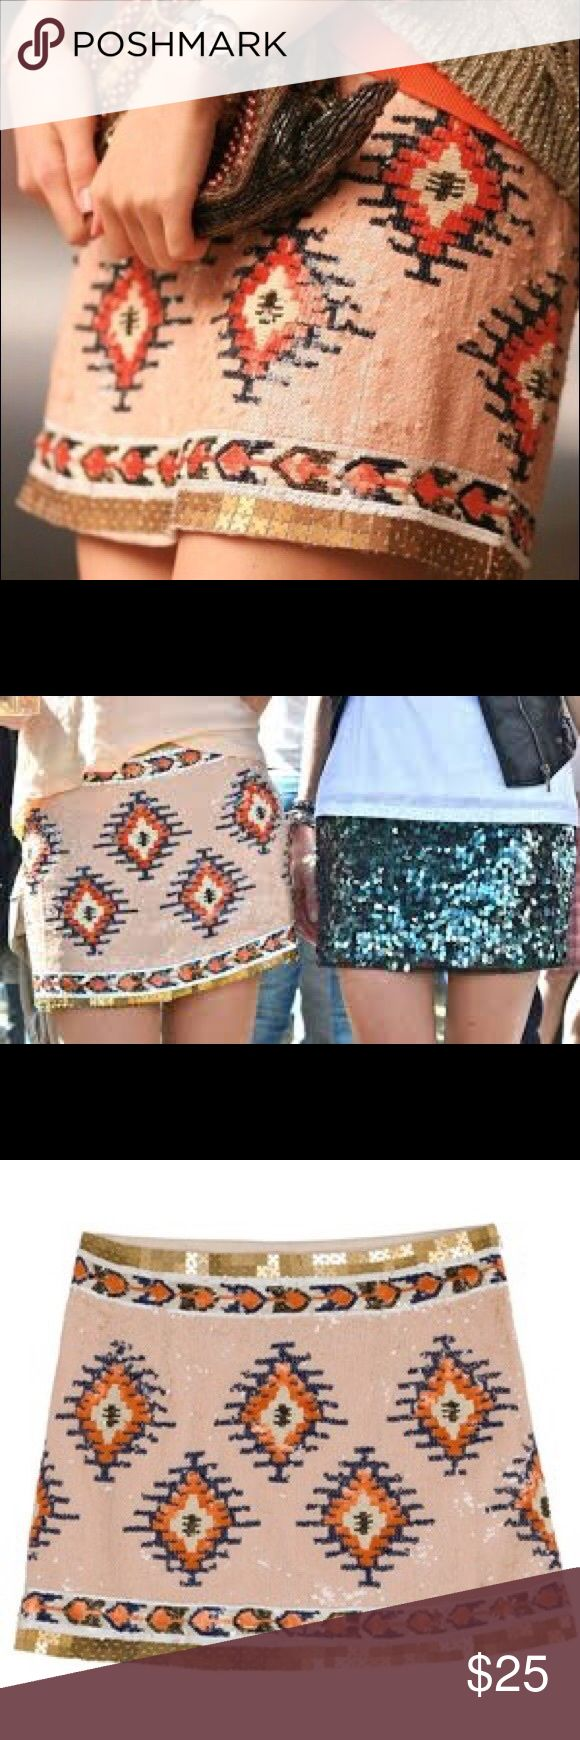 Zara sequin tribal mini skirt! Good condition. Minimal wear on the sequins - will post photos Zara Skirts Mini